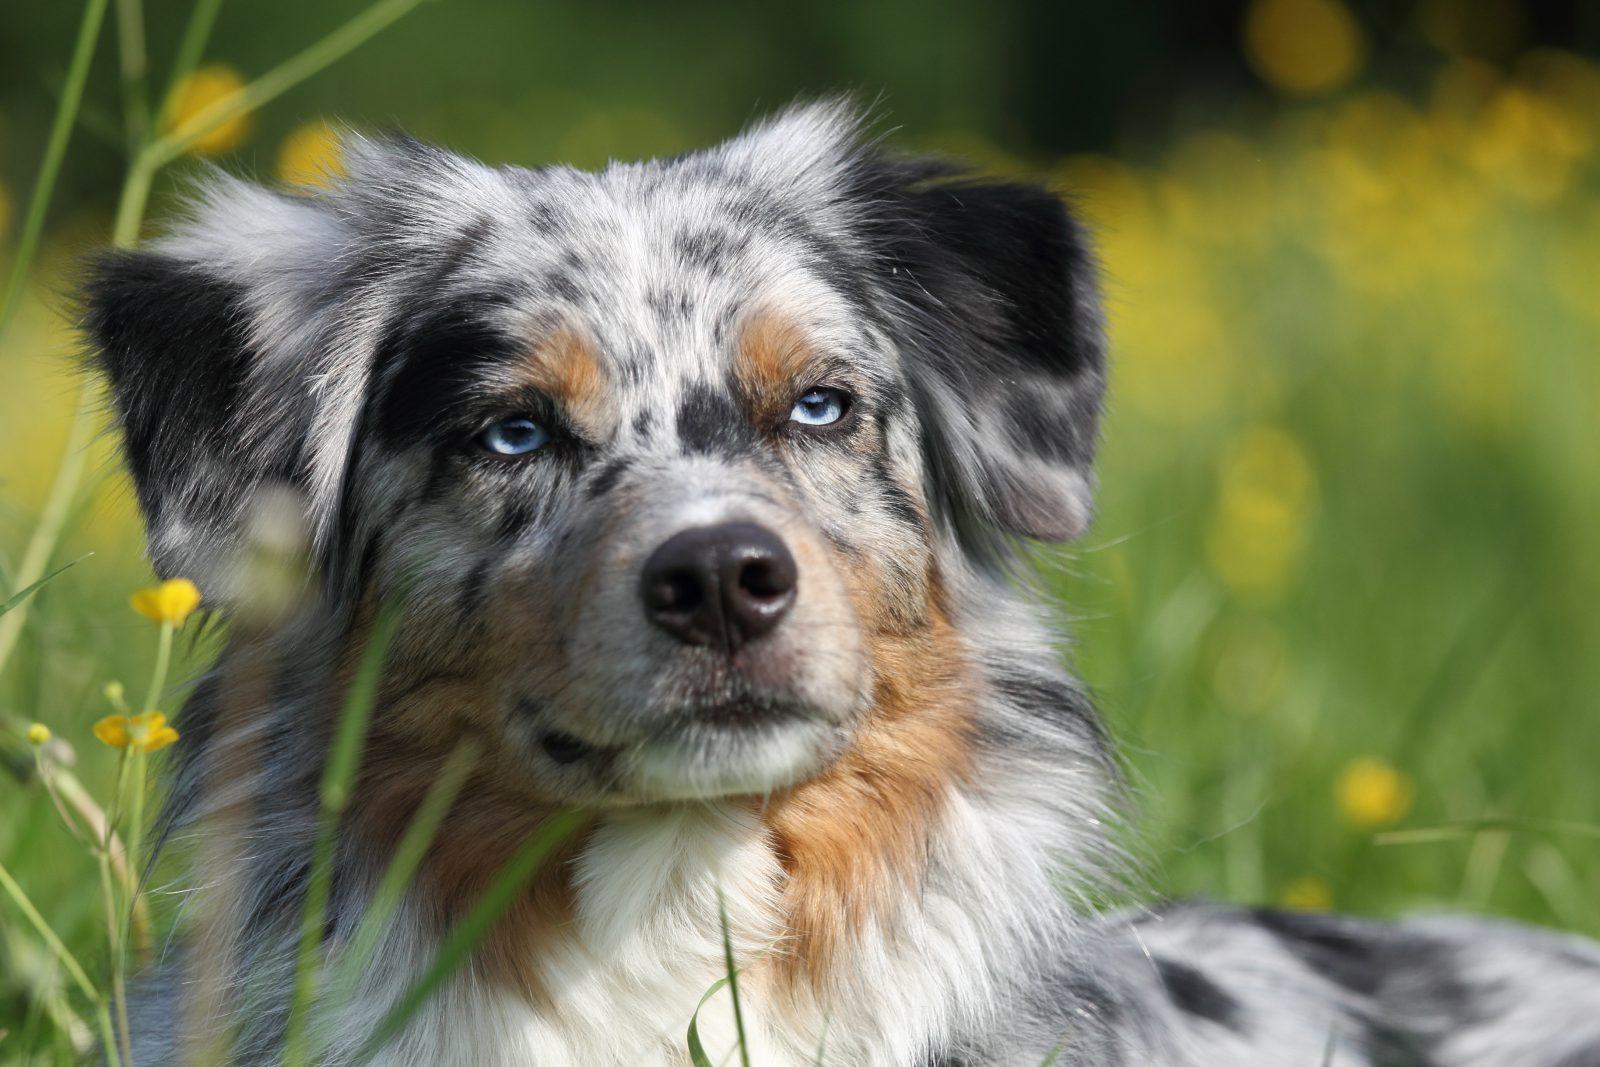 cao-pastor-australiano-aparencia